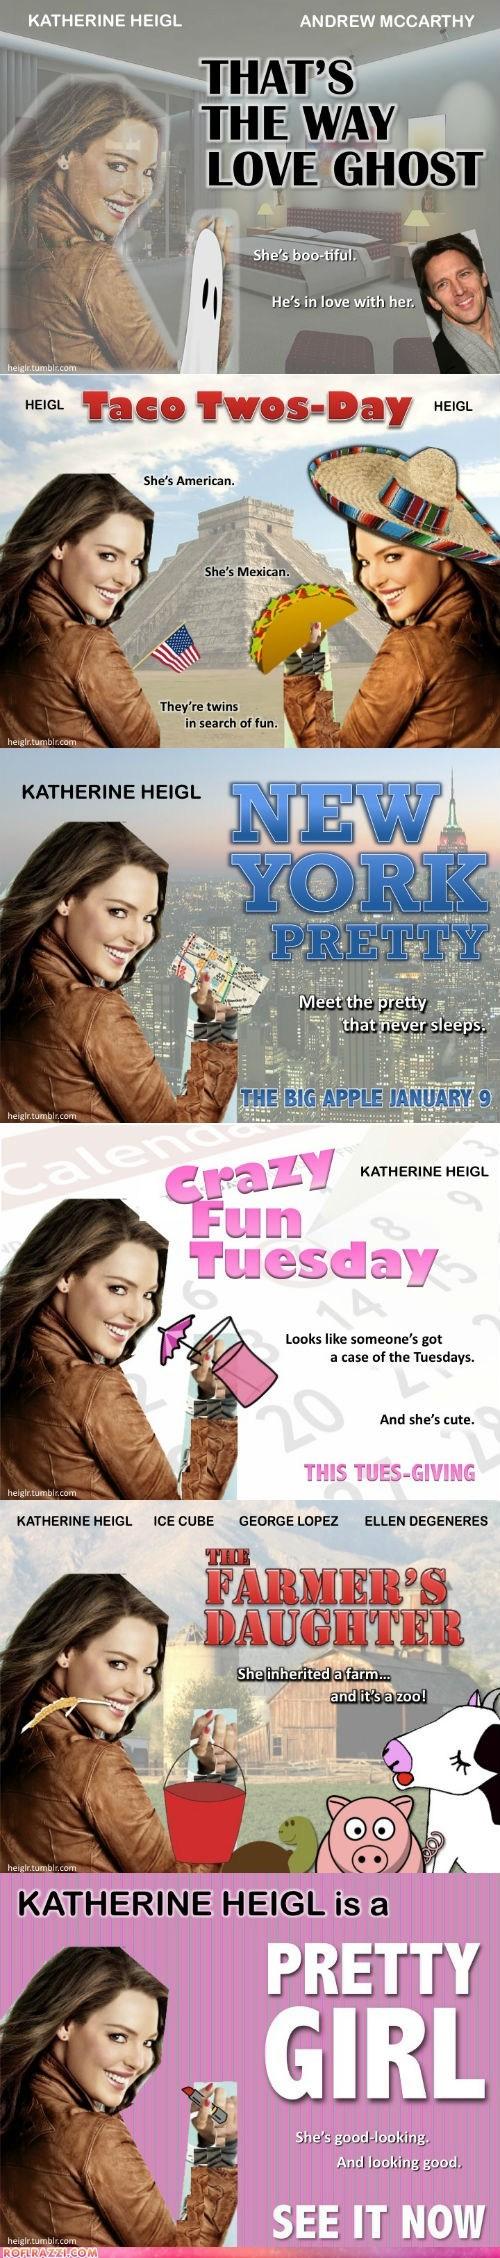 fake,katherine heigl,movie posters,movies,romantic comedies,stupid